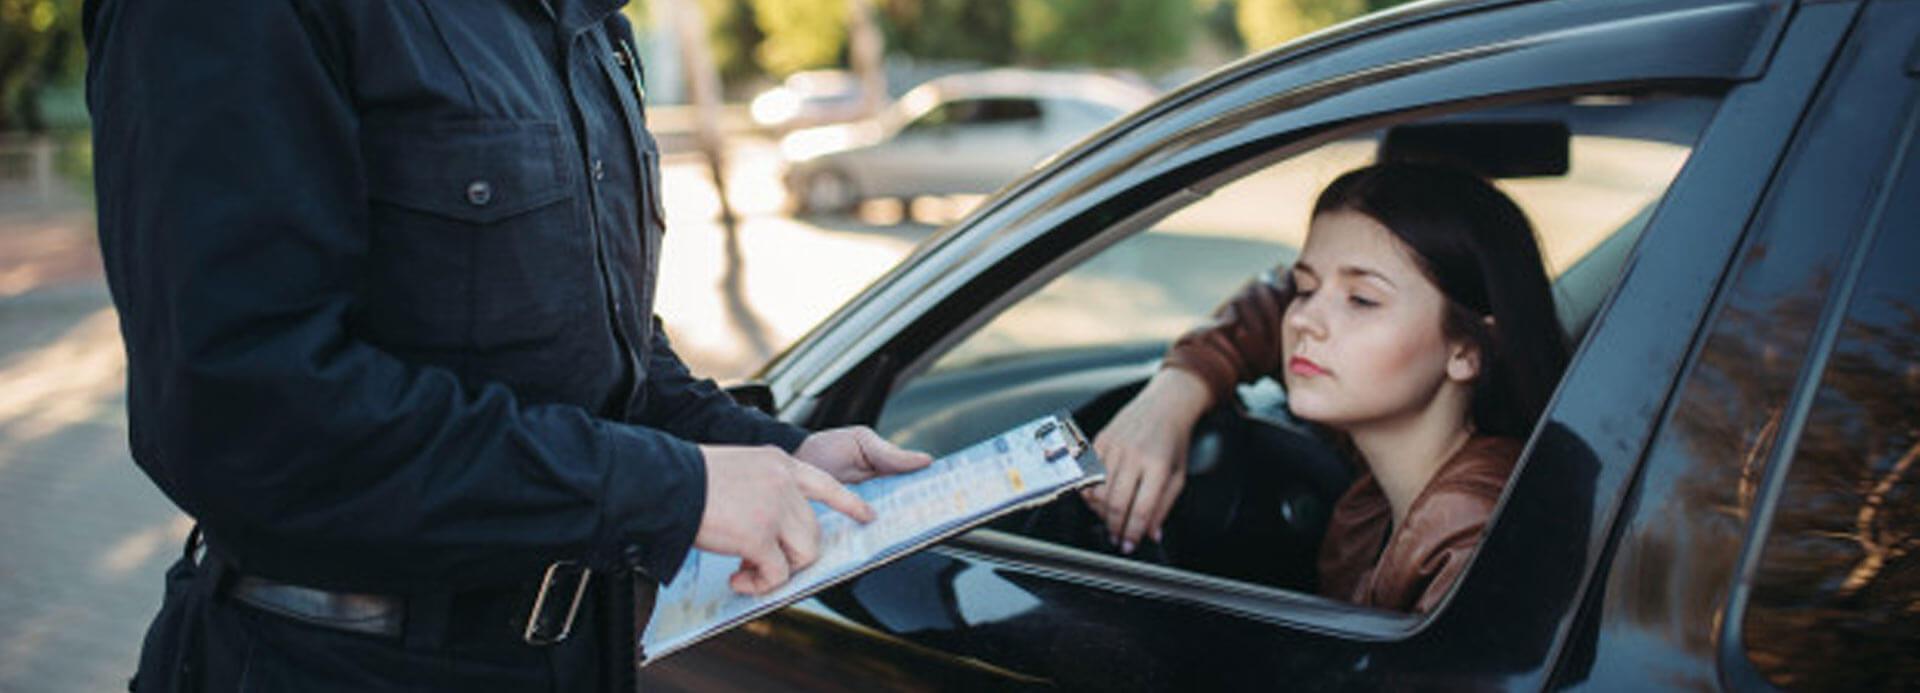 traffic violation The Law office of John Vermon Moore